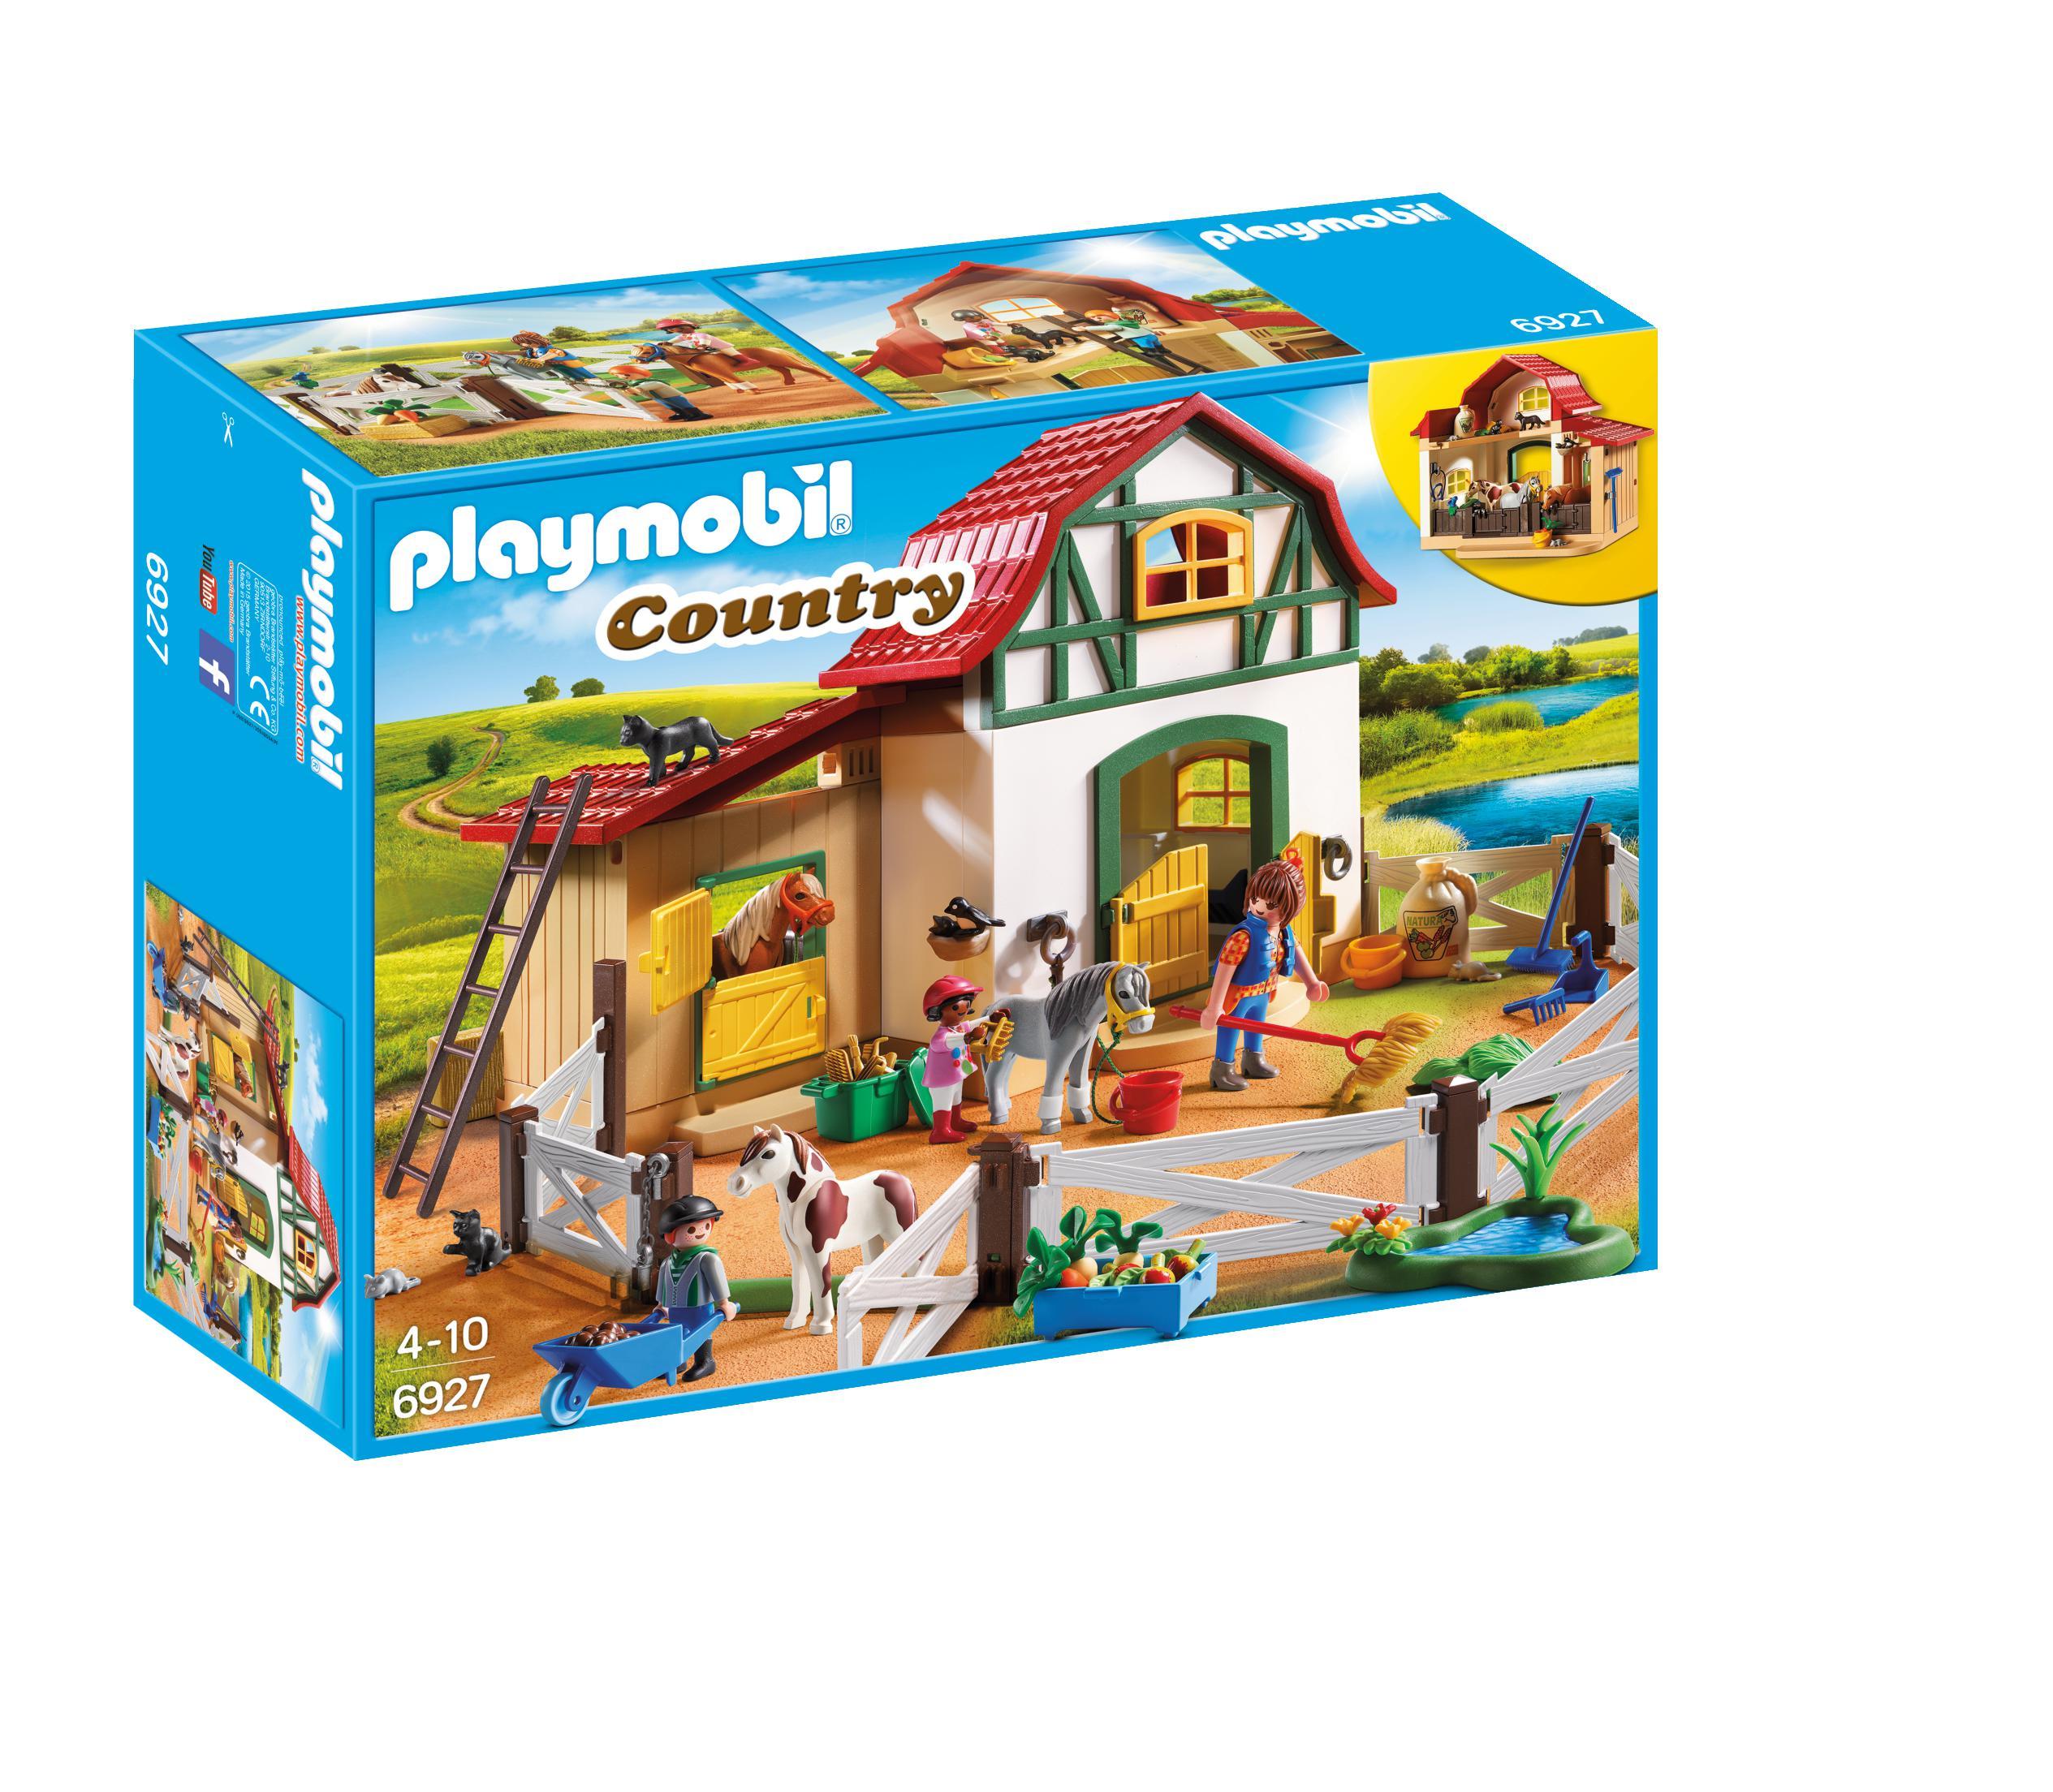 Maneggio dei pony - giocattoli toys center - PLAYMOBIL - COUNTRY